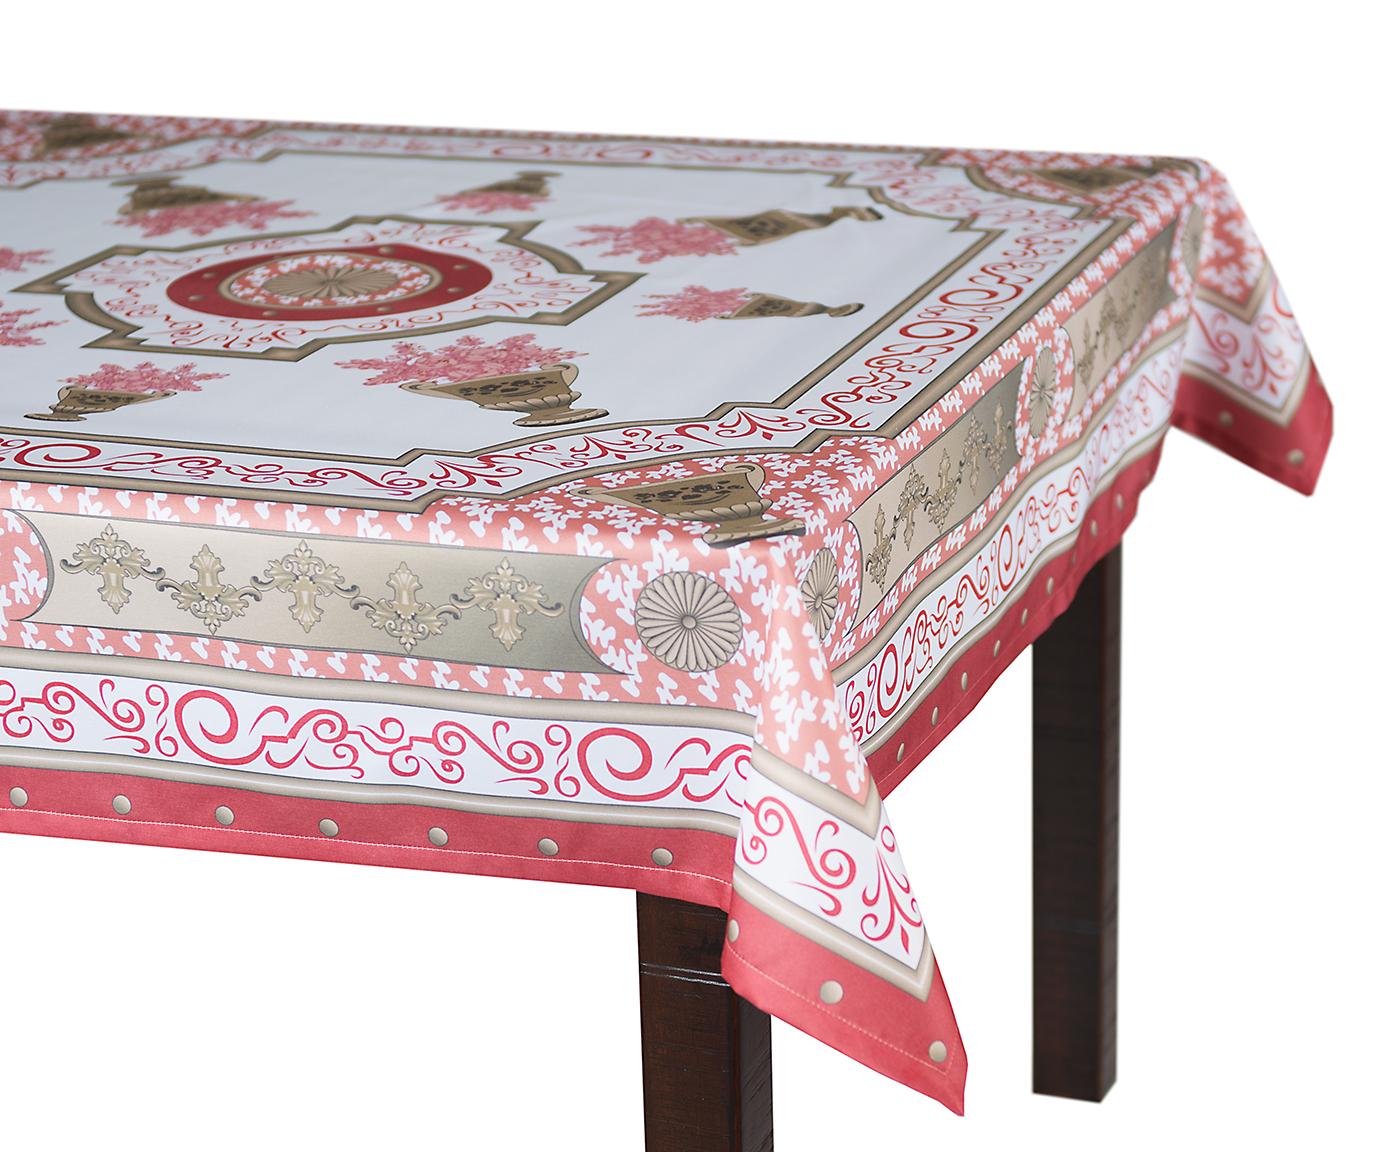 Кухня Скатерть 140x140 Blonder Home Rosetta розовая skatert-140x140-blonder-home-rosetta-rozovaya-ssha-rossiya.jpg